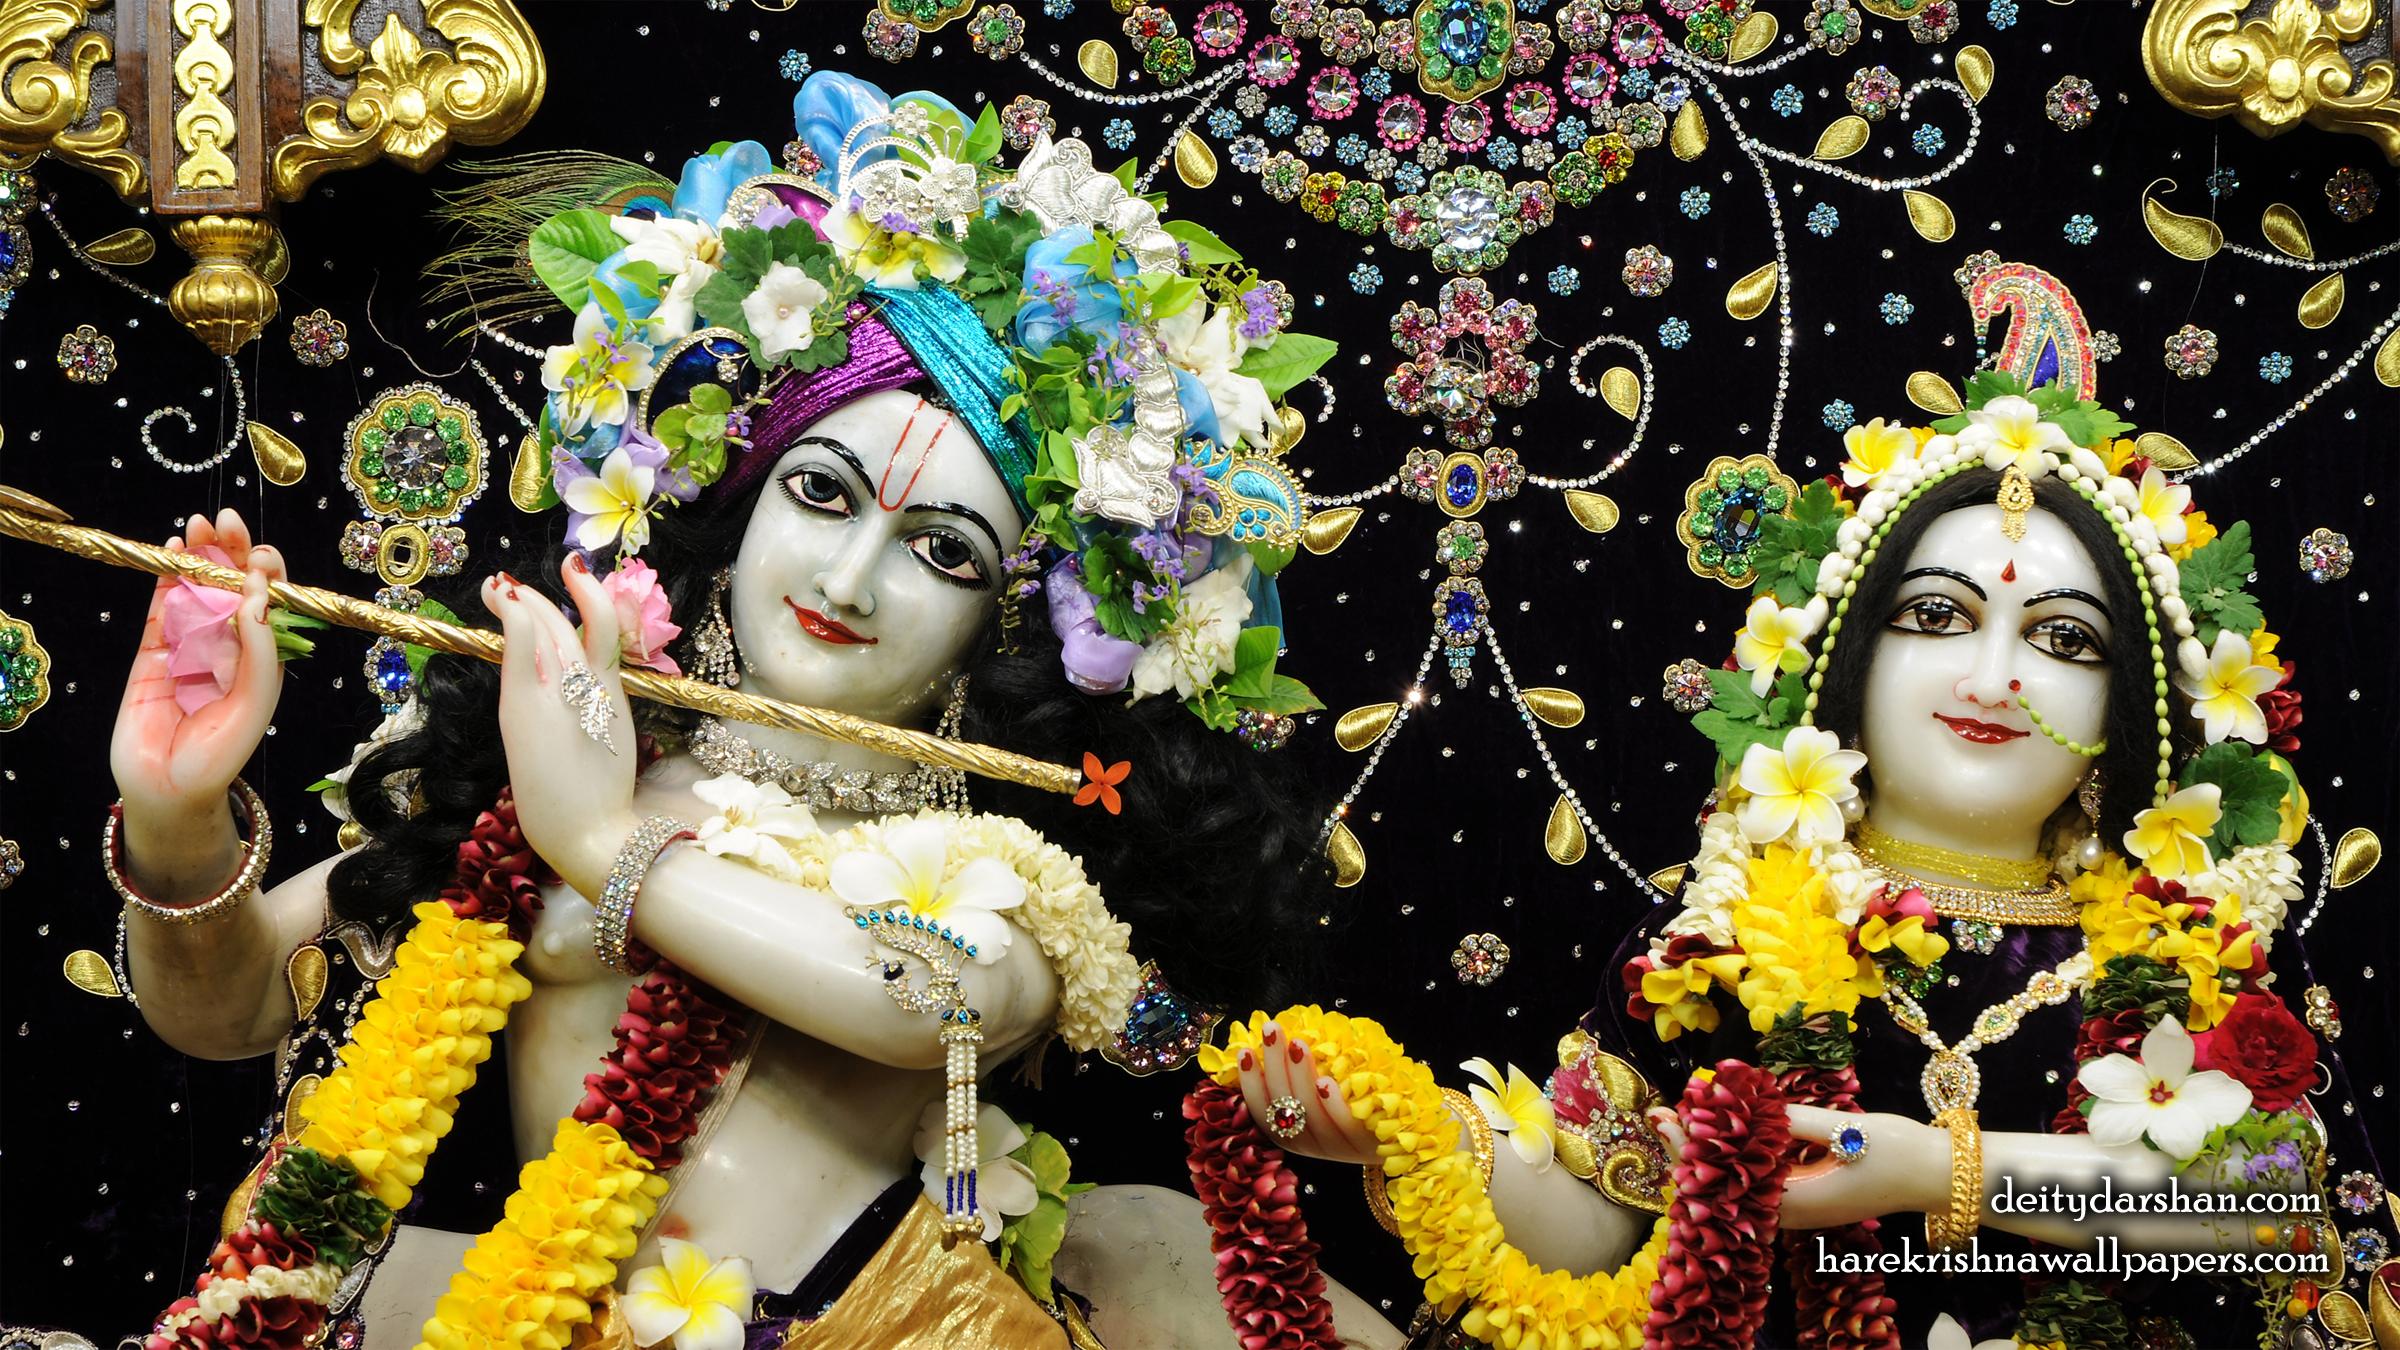 Sri Sri Radha Gopinath Close up Wallpaper (067) Size 2400x1350 Download